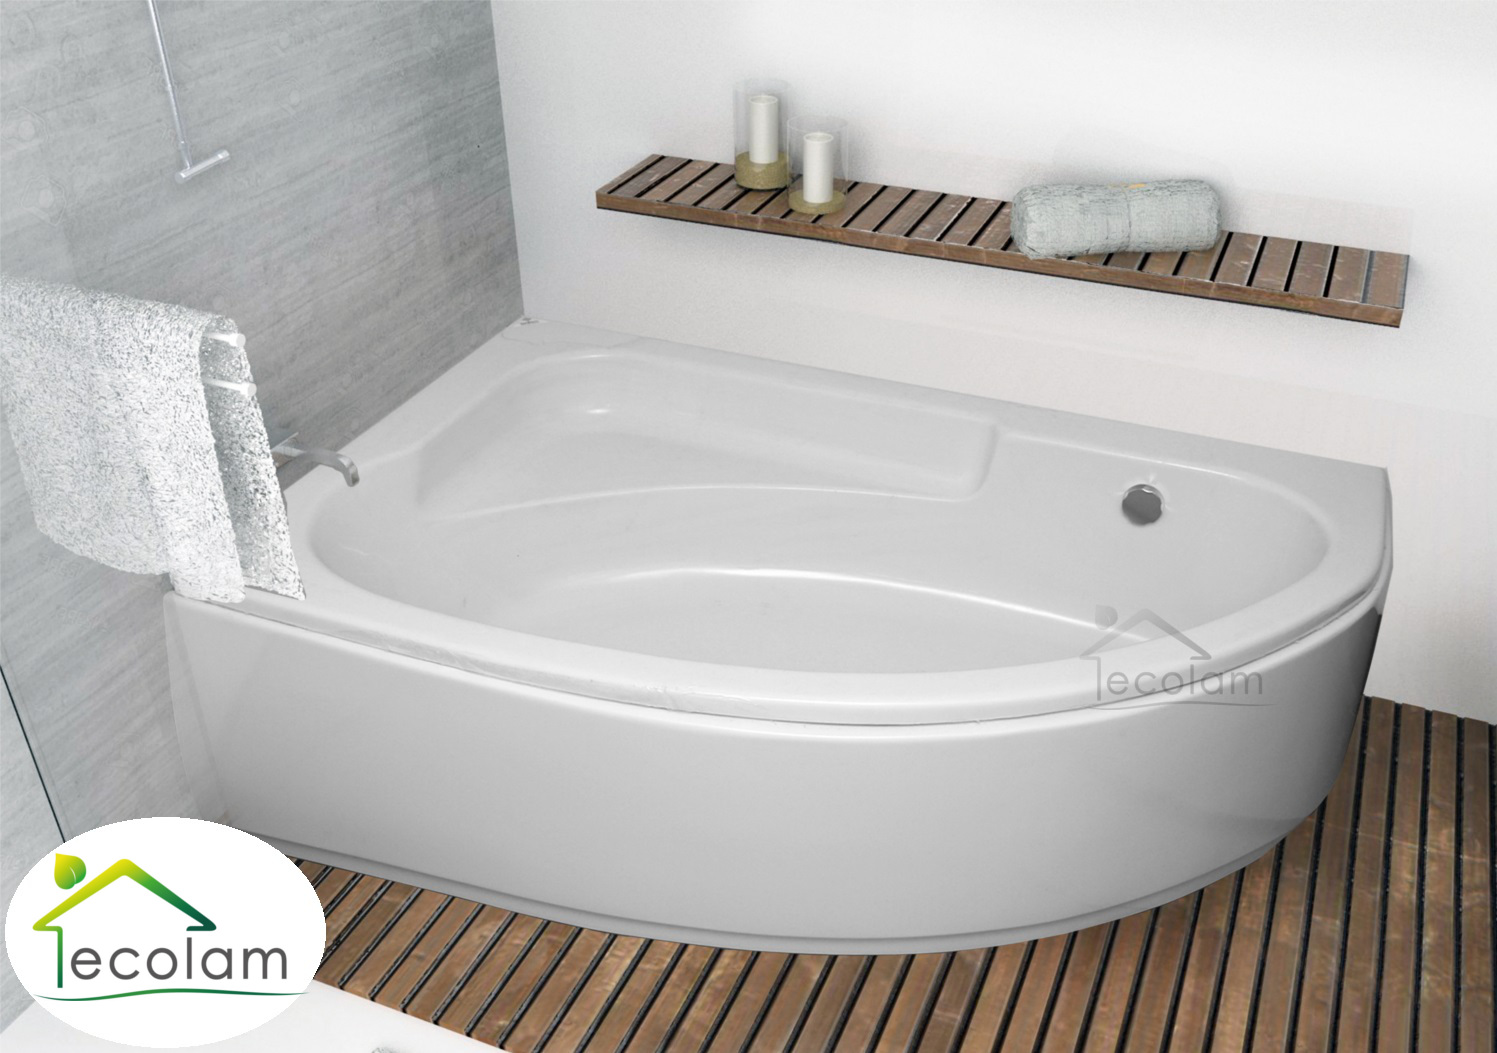 badewanne wanne eckwanne acryl 150 x 100 cm sch rze f e ablauf silikon links ebay. Black Bedroom Furniture Sets. Home Design Ideas